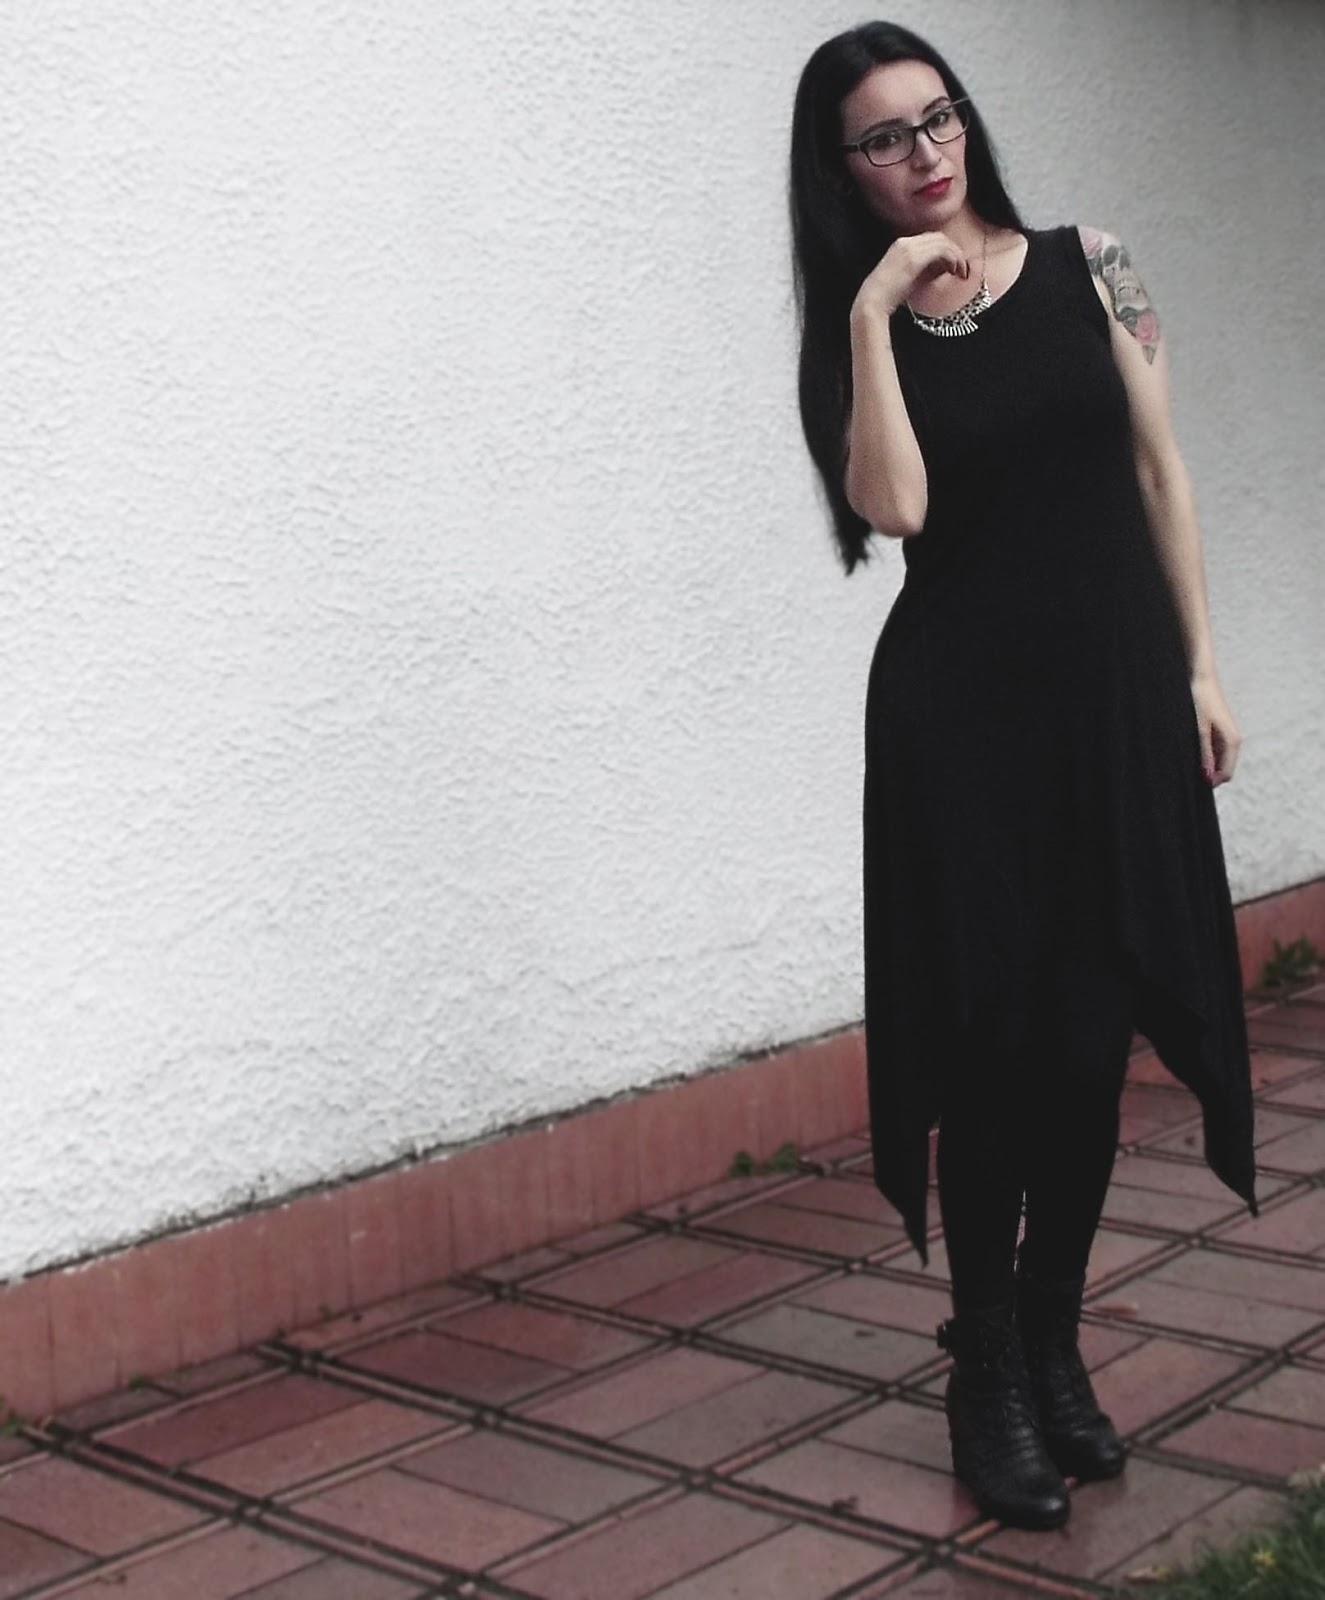 ROPA NEGRA: Ideas para vestir gótico, moda alternativa.